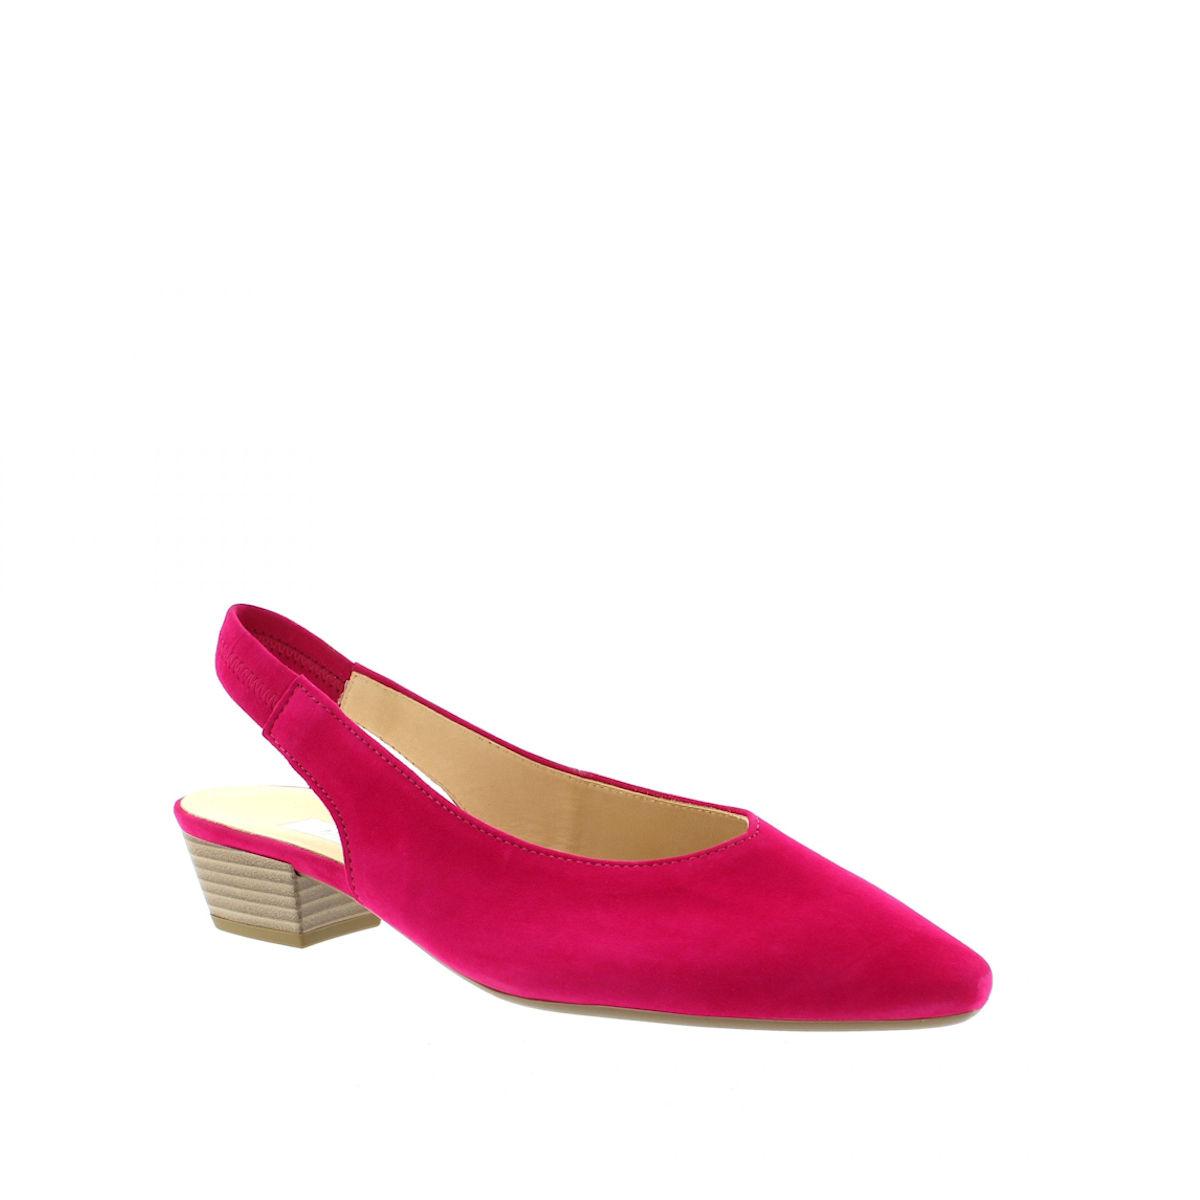 Gabor Heathcliff slingback court shoe fuchsia